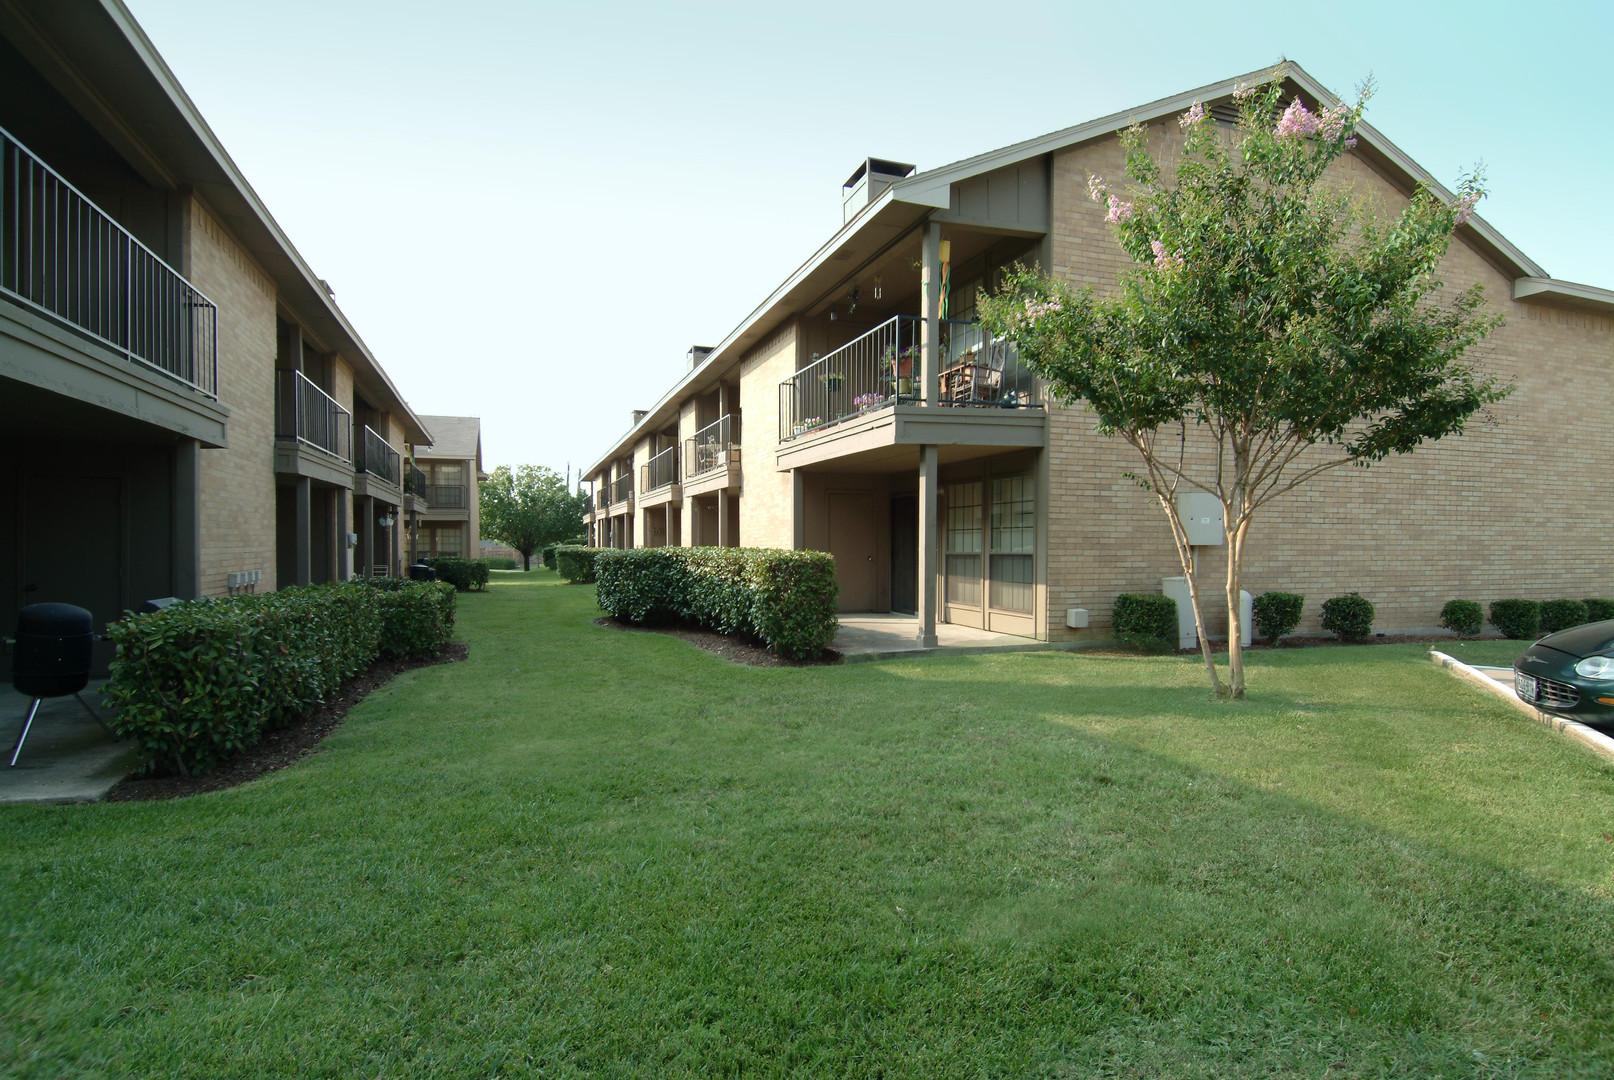 Country Club Condos Courtyard.JPG